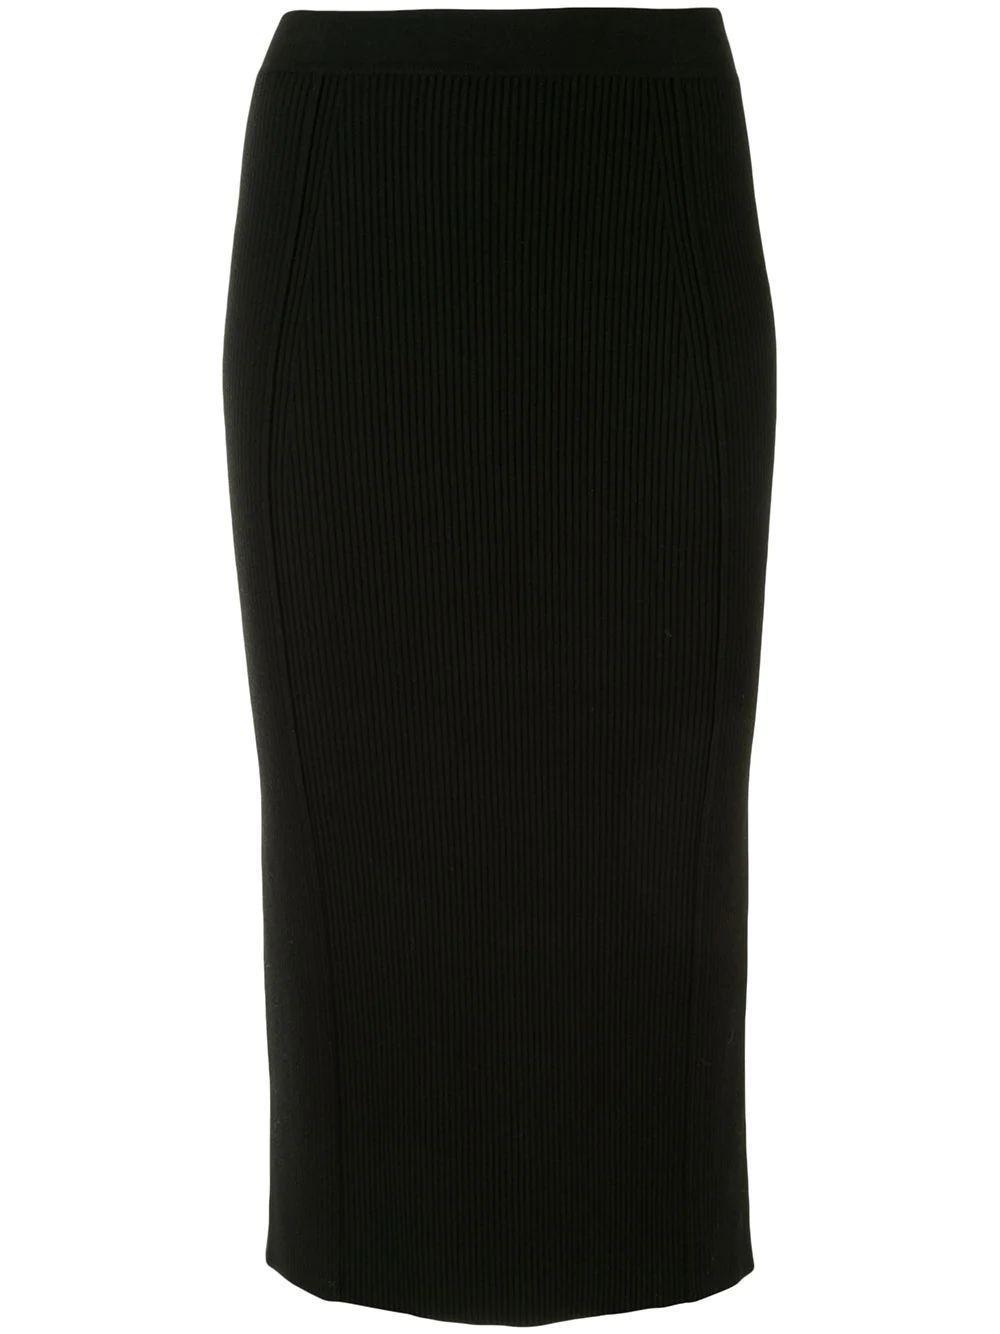 Sienna Midi Skirt